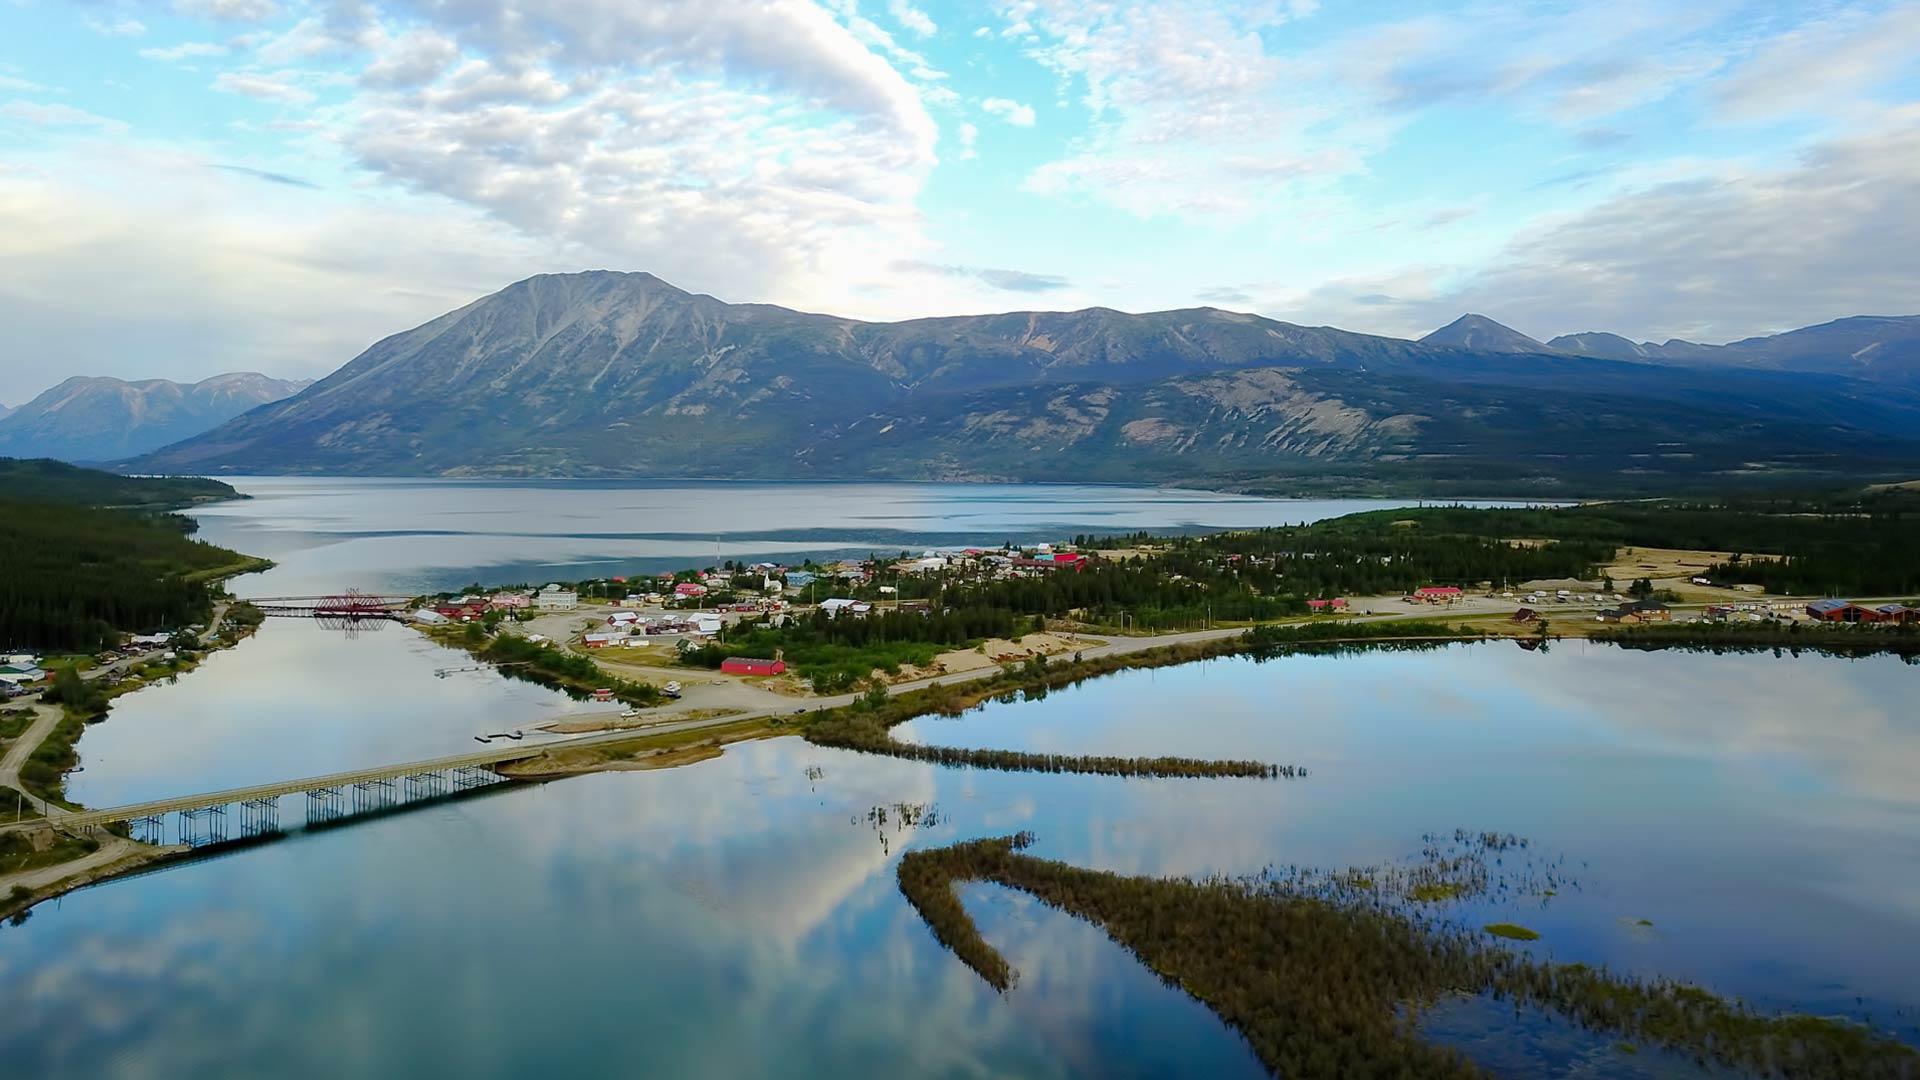 Desktop Wallpaper Fall Water Southern Lakes Region Travel Yukon Yukon Canada